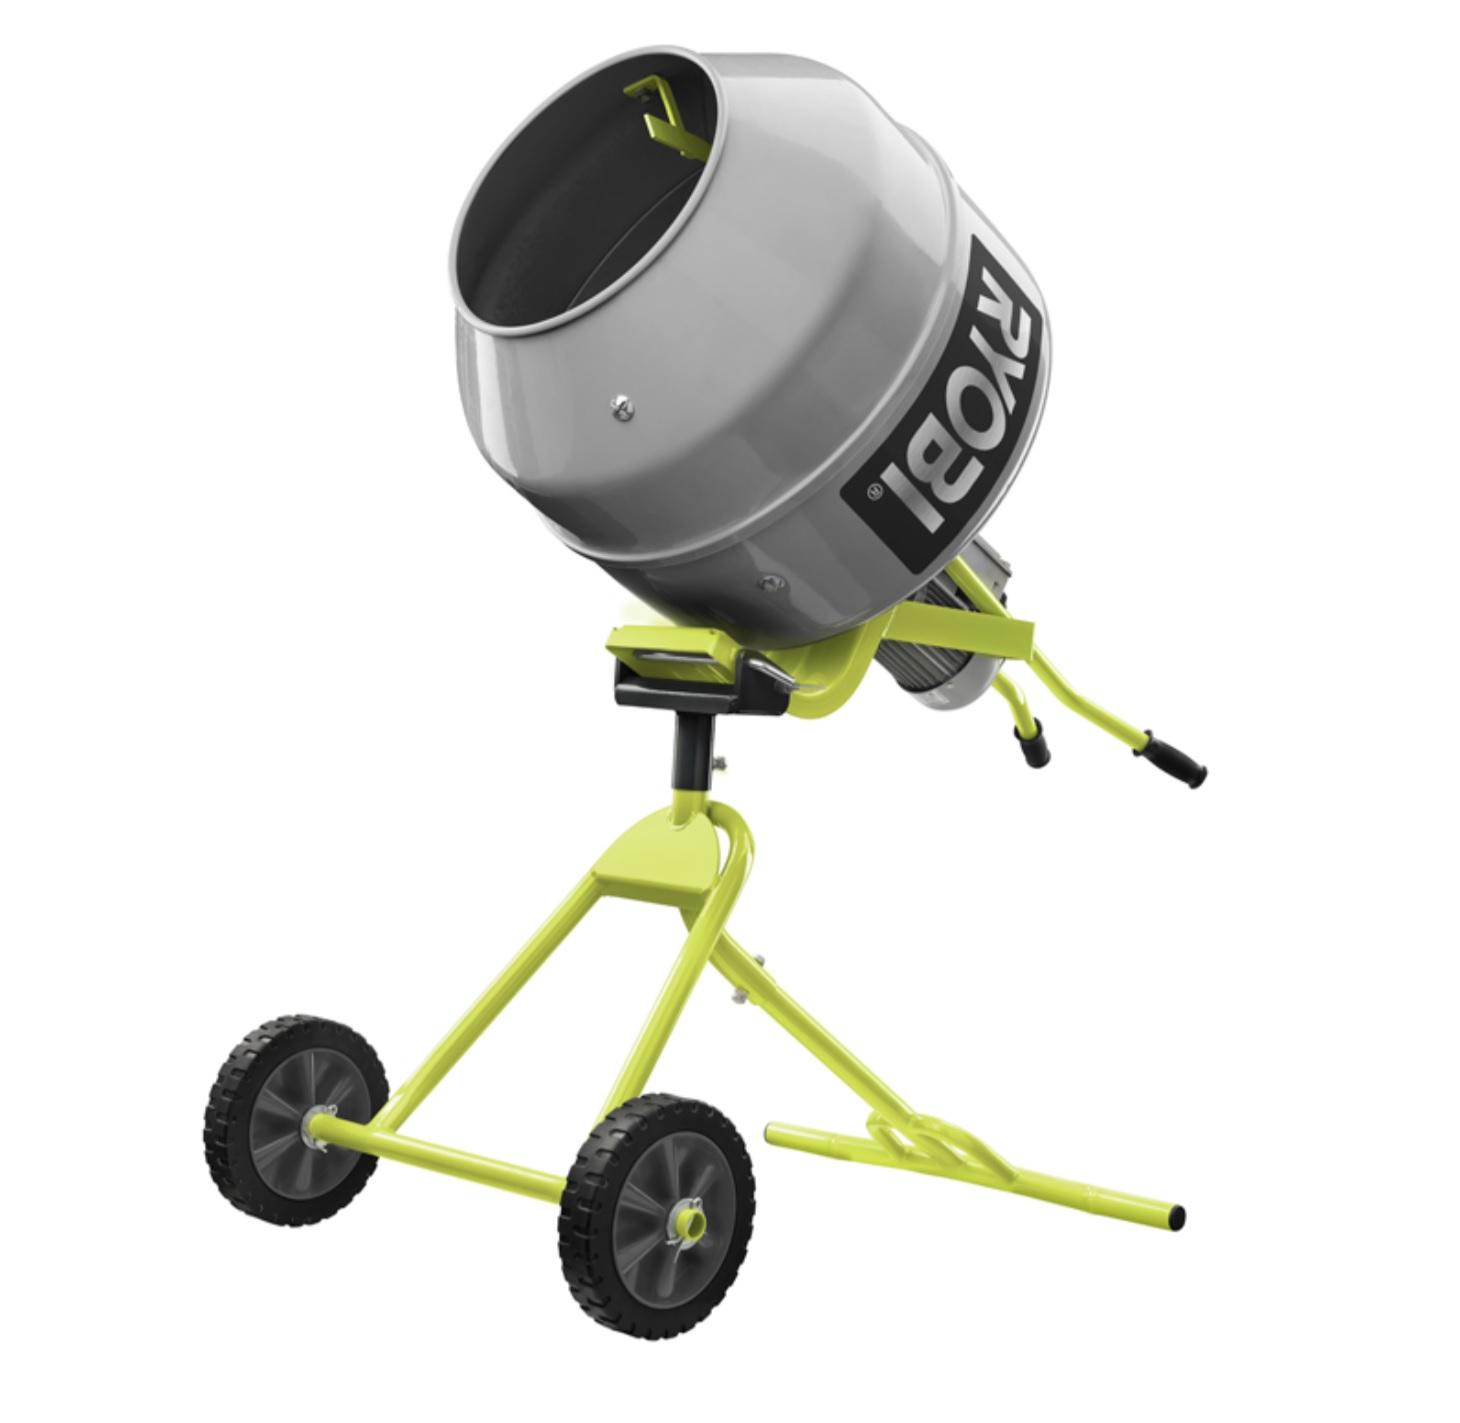 RYOBI RMX001 Portable Cement Mixer - Tool Craze